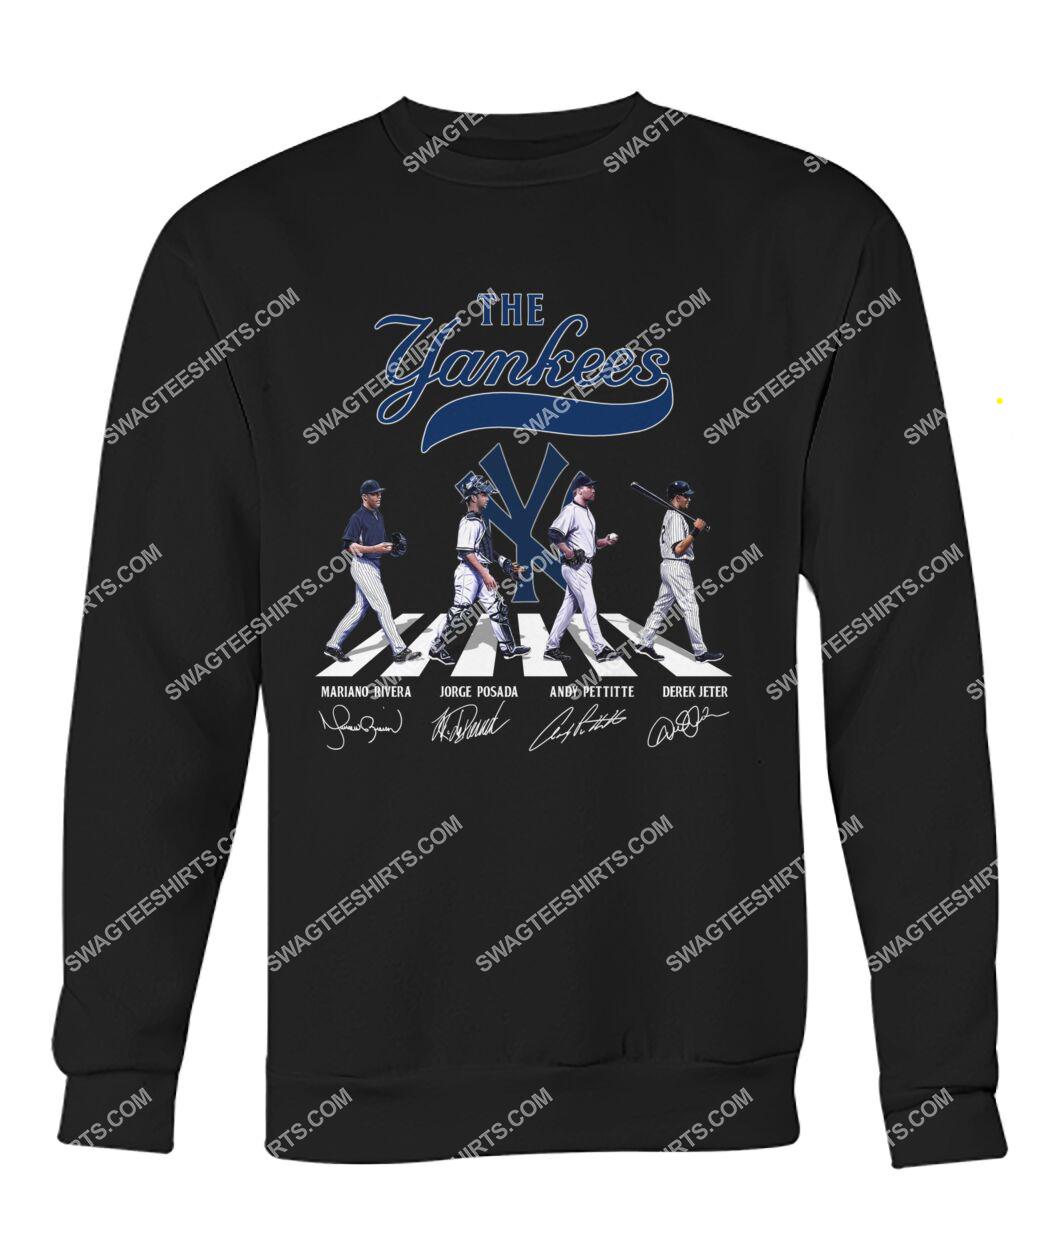 the new york yankees walking abbey road sweatshirt 1